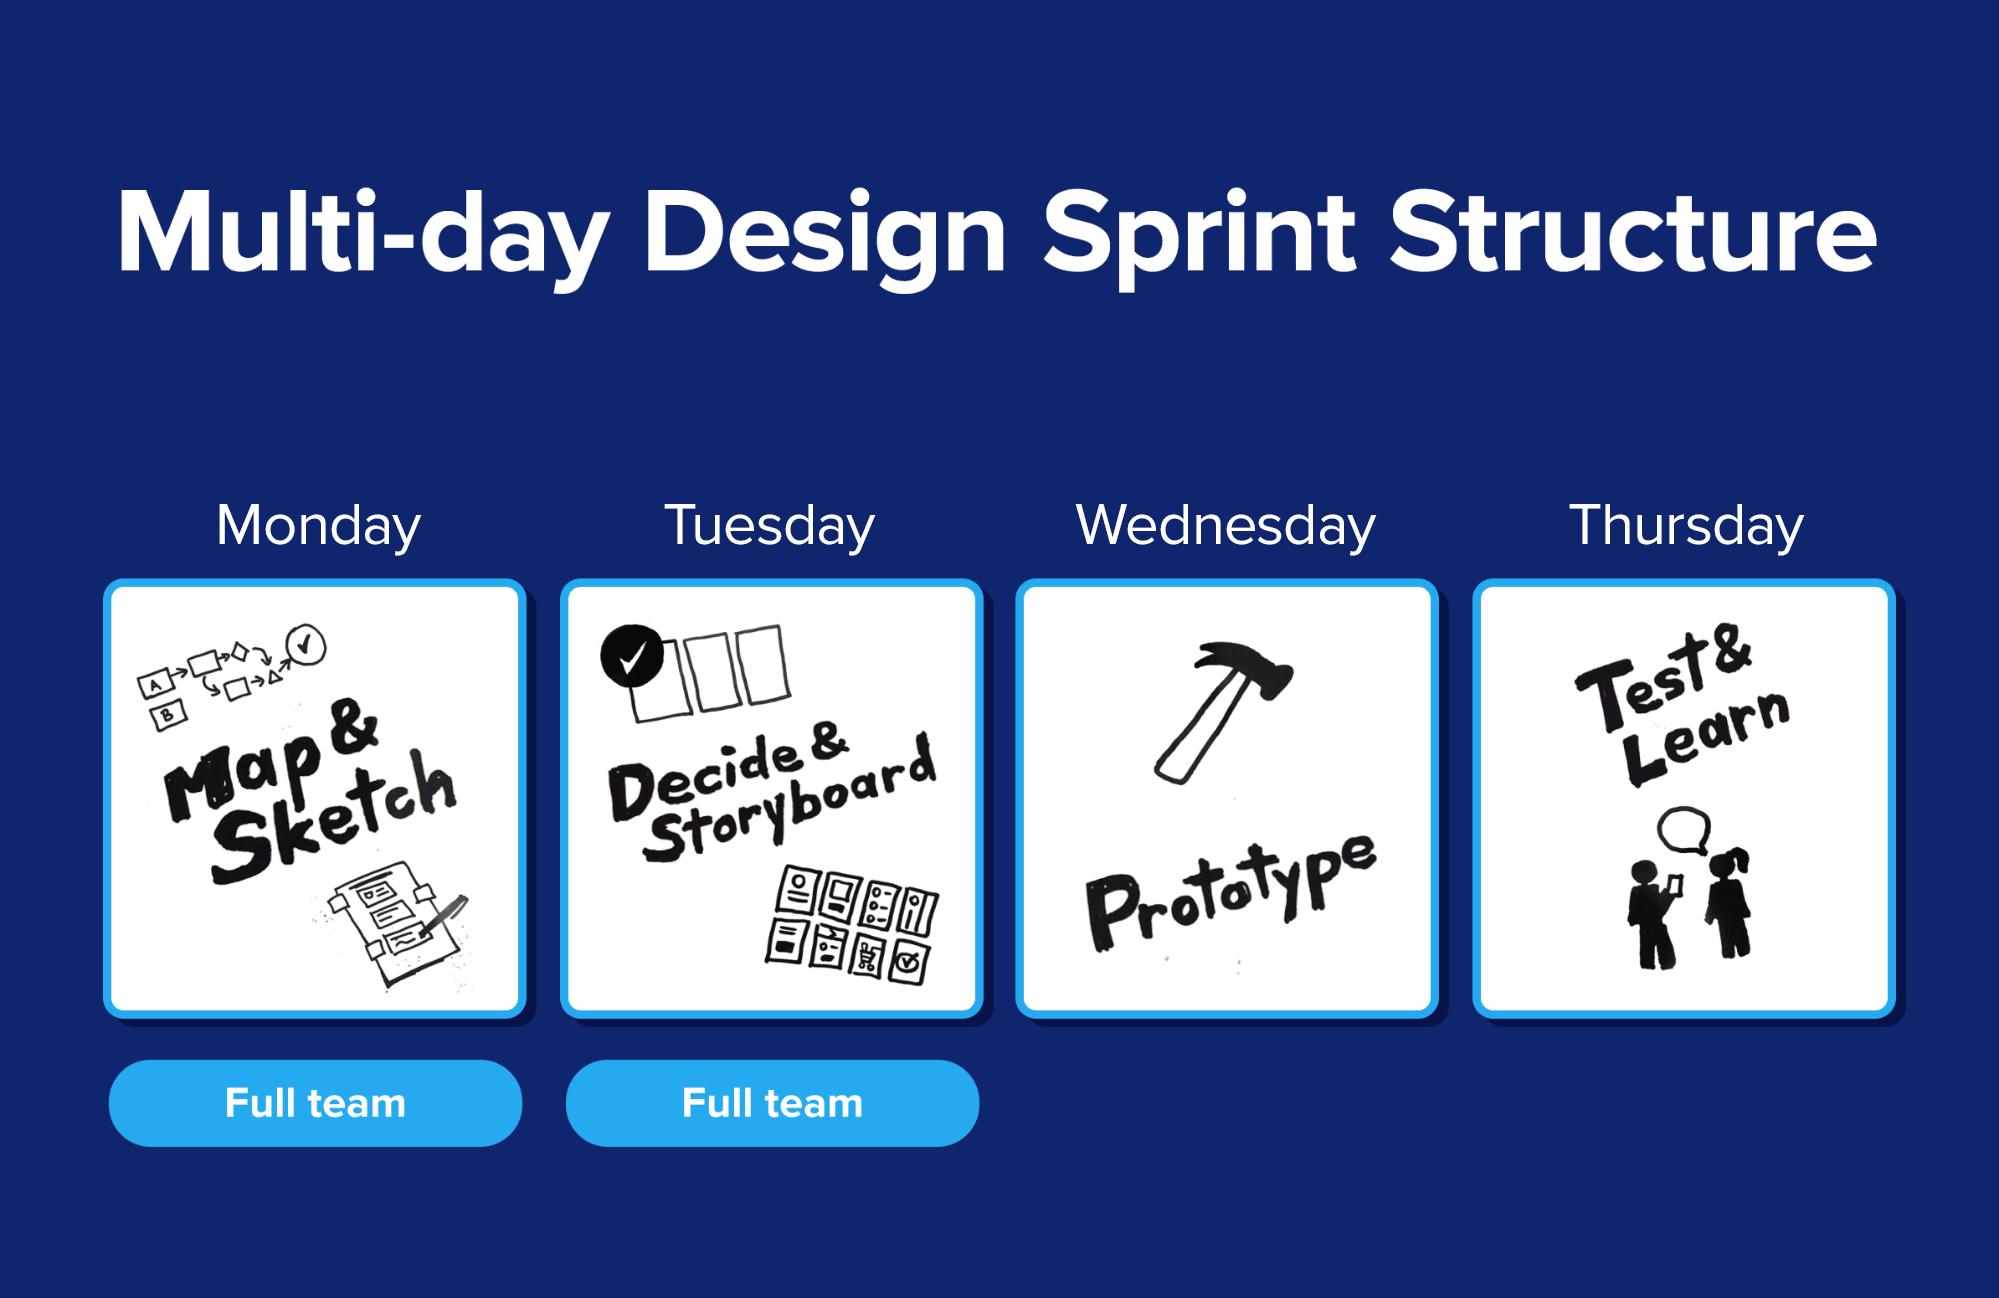 The multi-day design sprint process